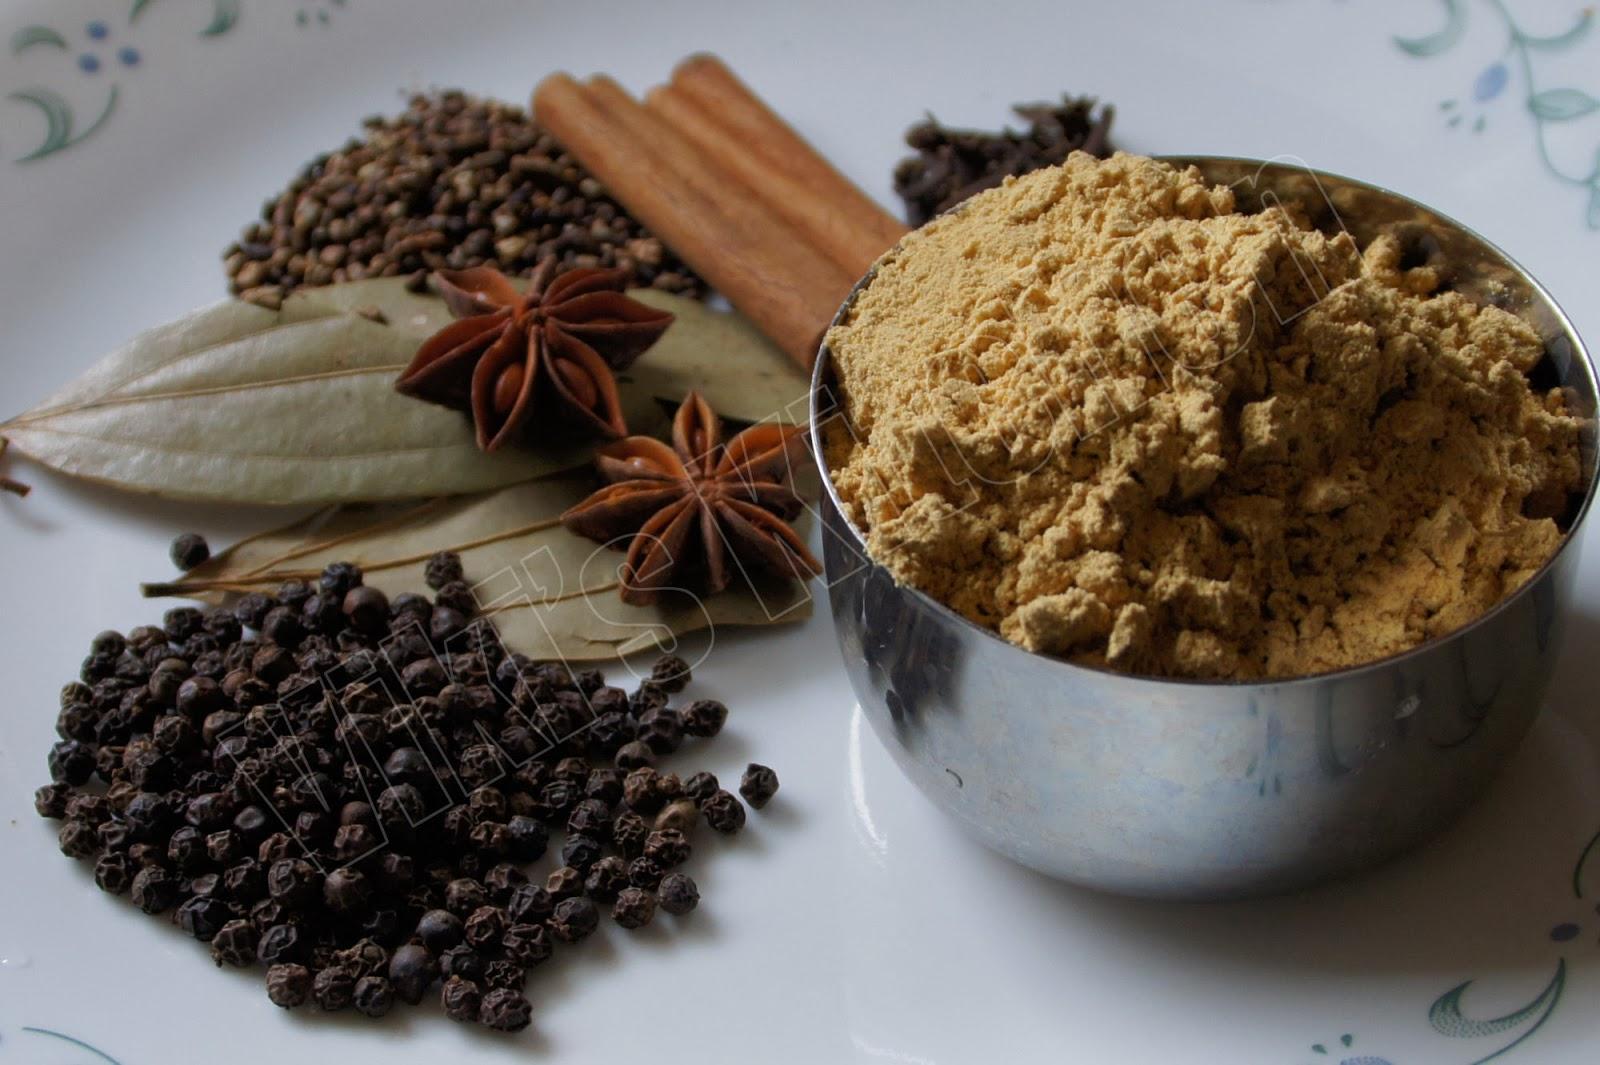 Viki S Kitchen Masala Tea And Homemade Tea Masala Powder